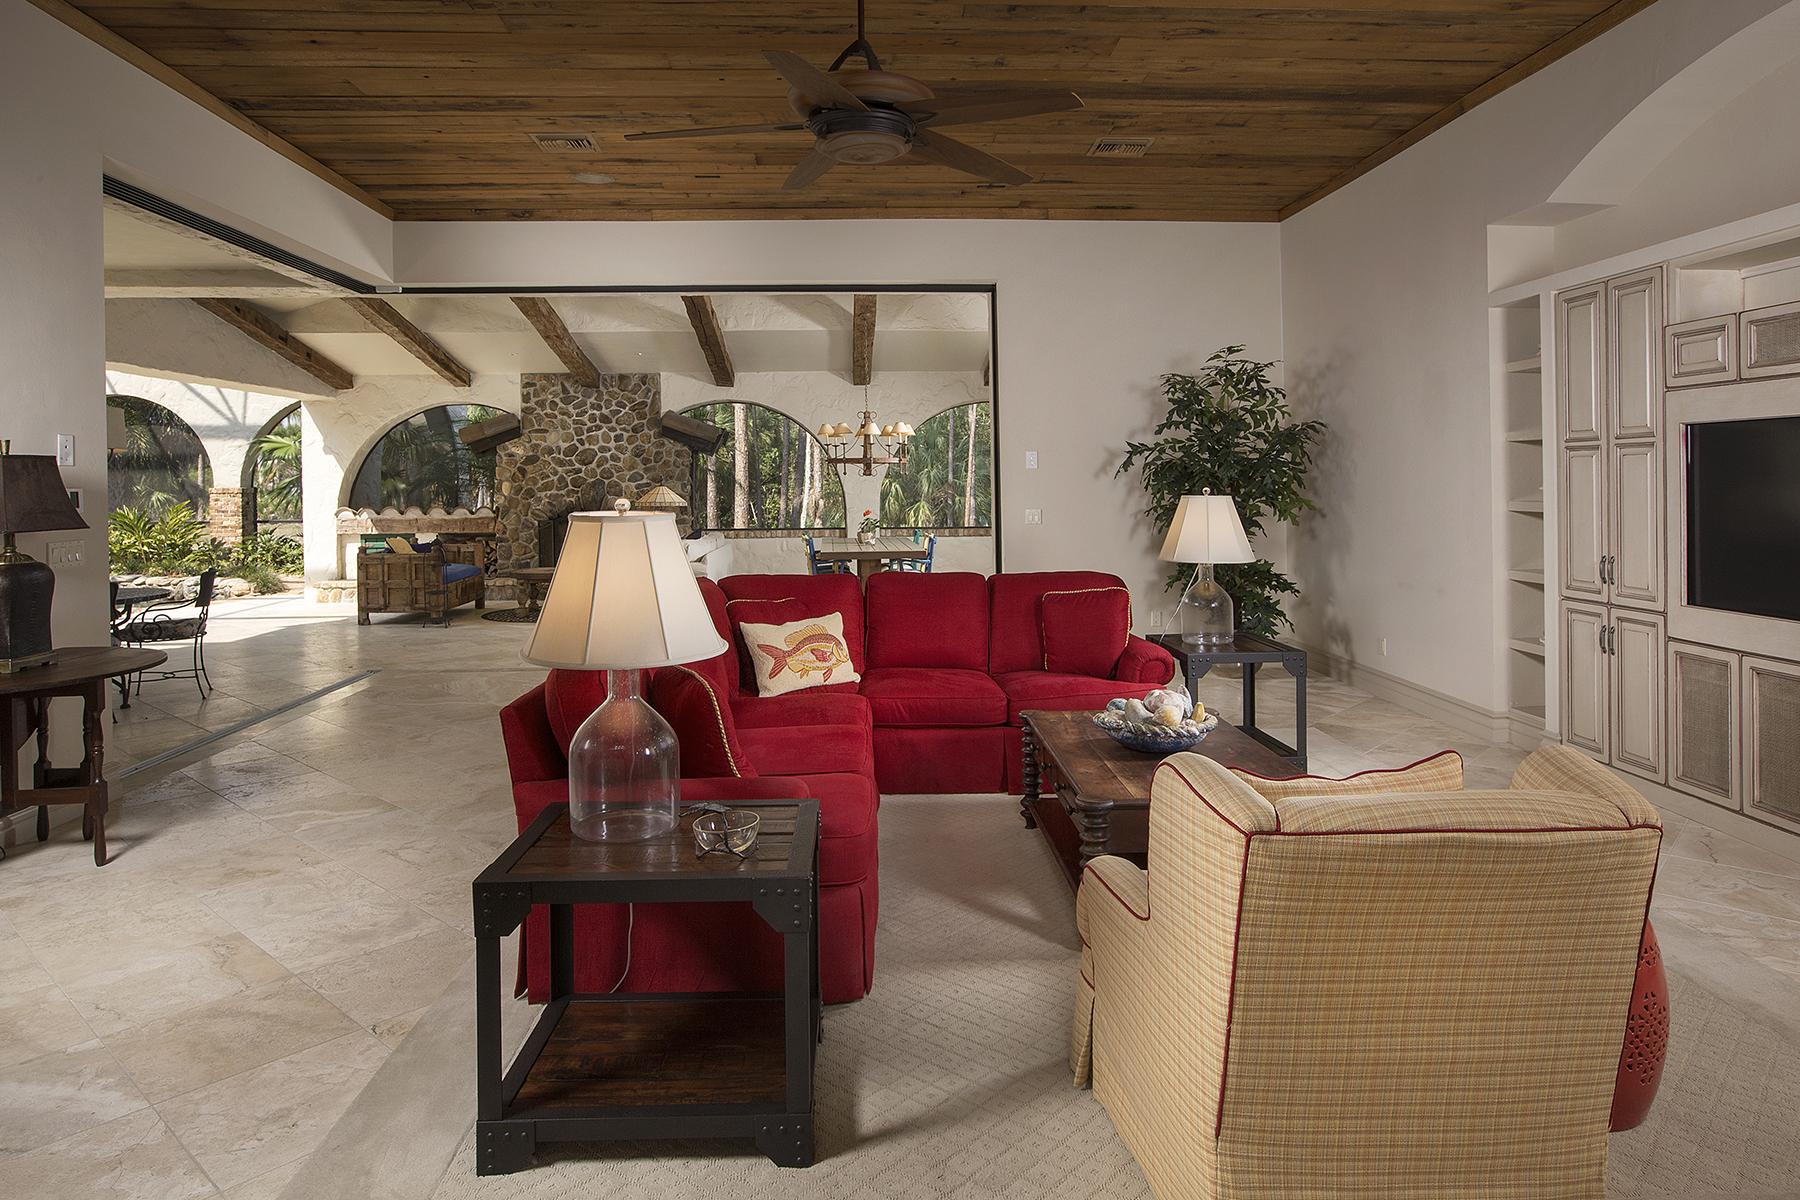 Additional photo for property listing at MEDITERRA - PADOVA 15151  Brolio Ln,  Naples, Florida 34110 United States